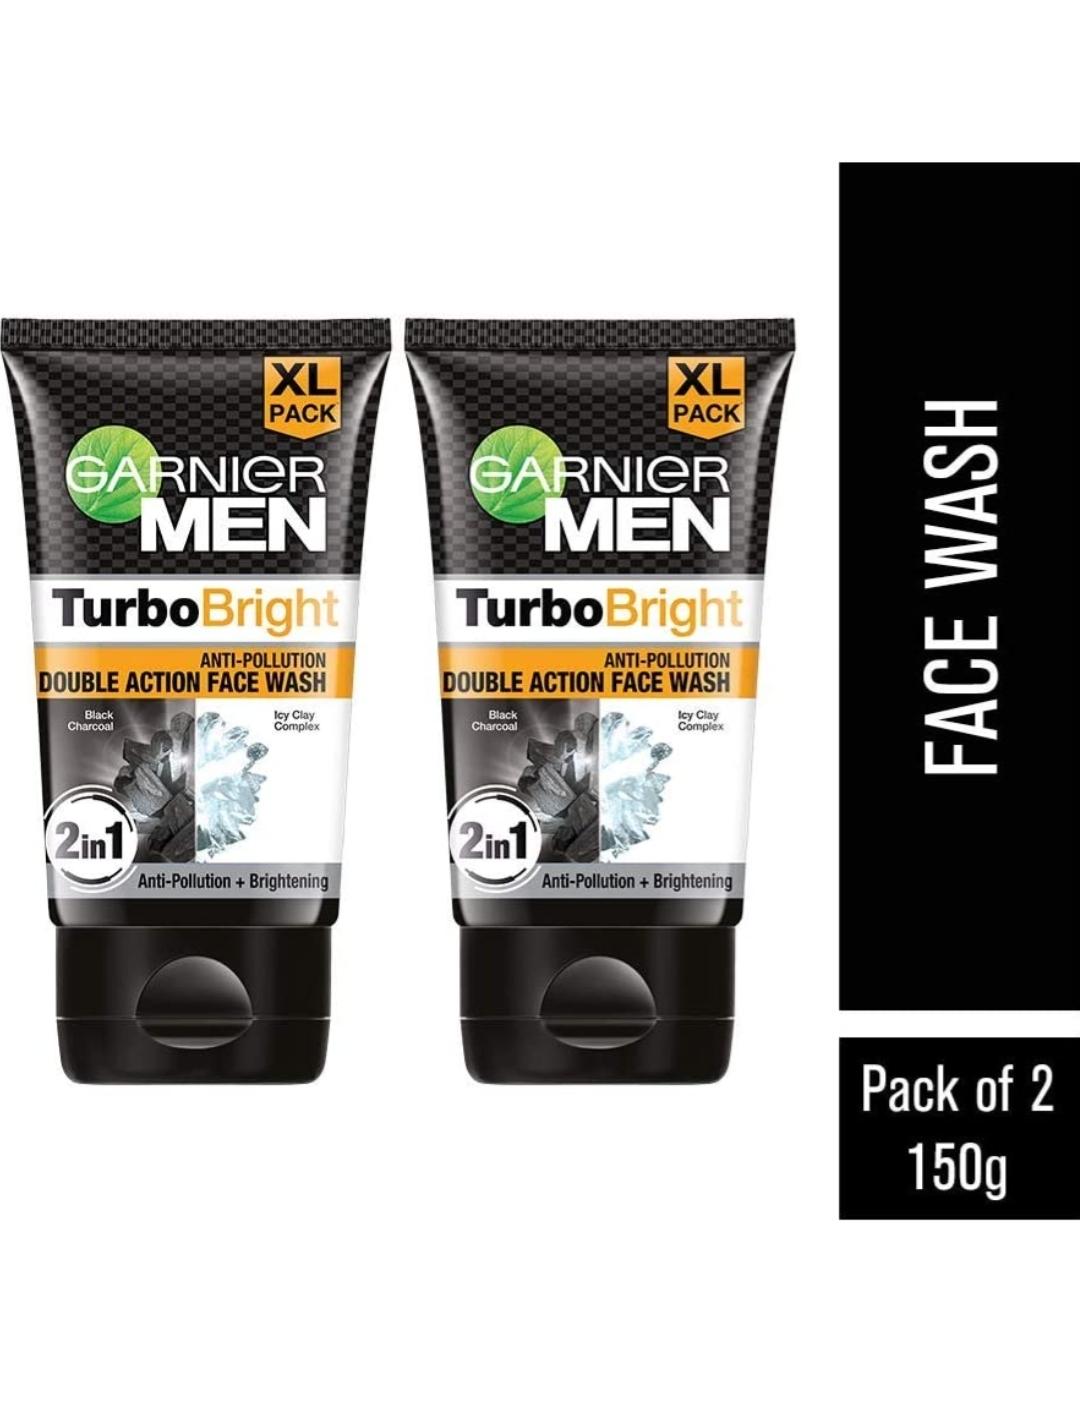 Garnier Men Turbo Bright Facewash - Charcoal Skin Brightening Facewash,...